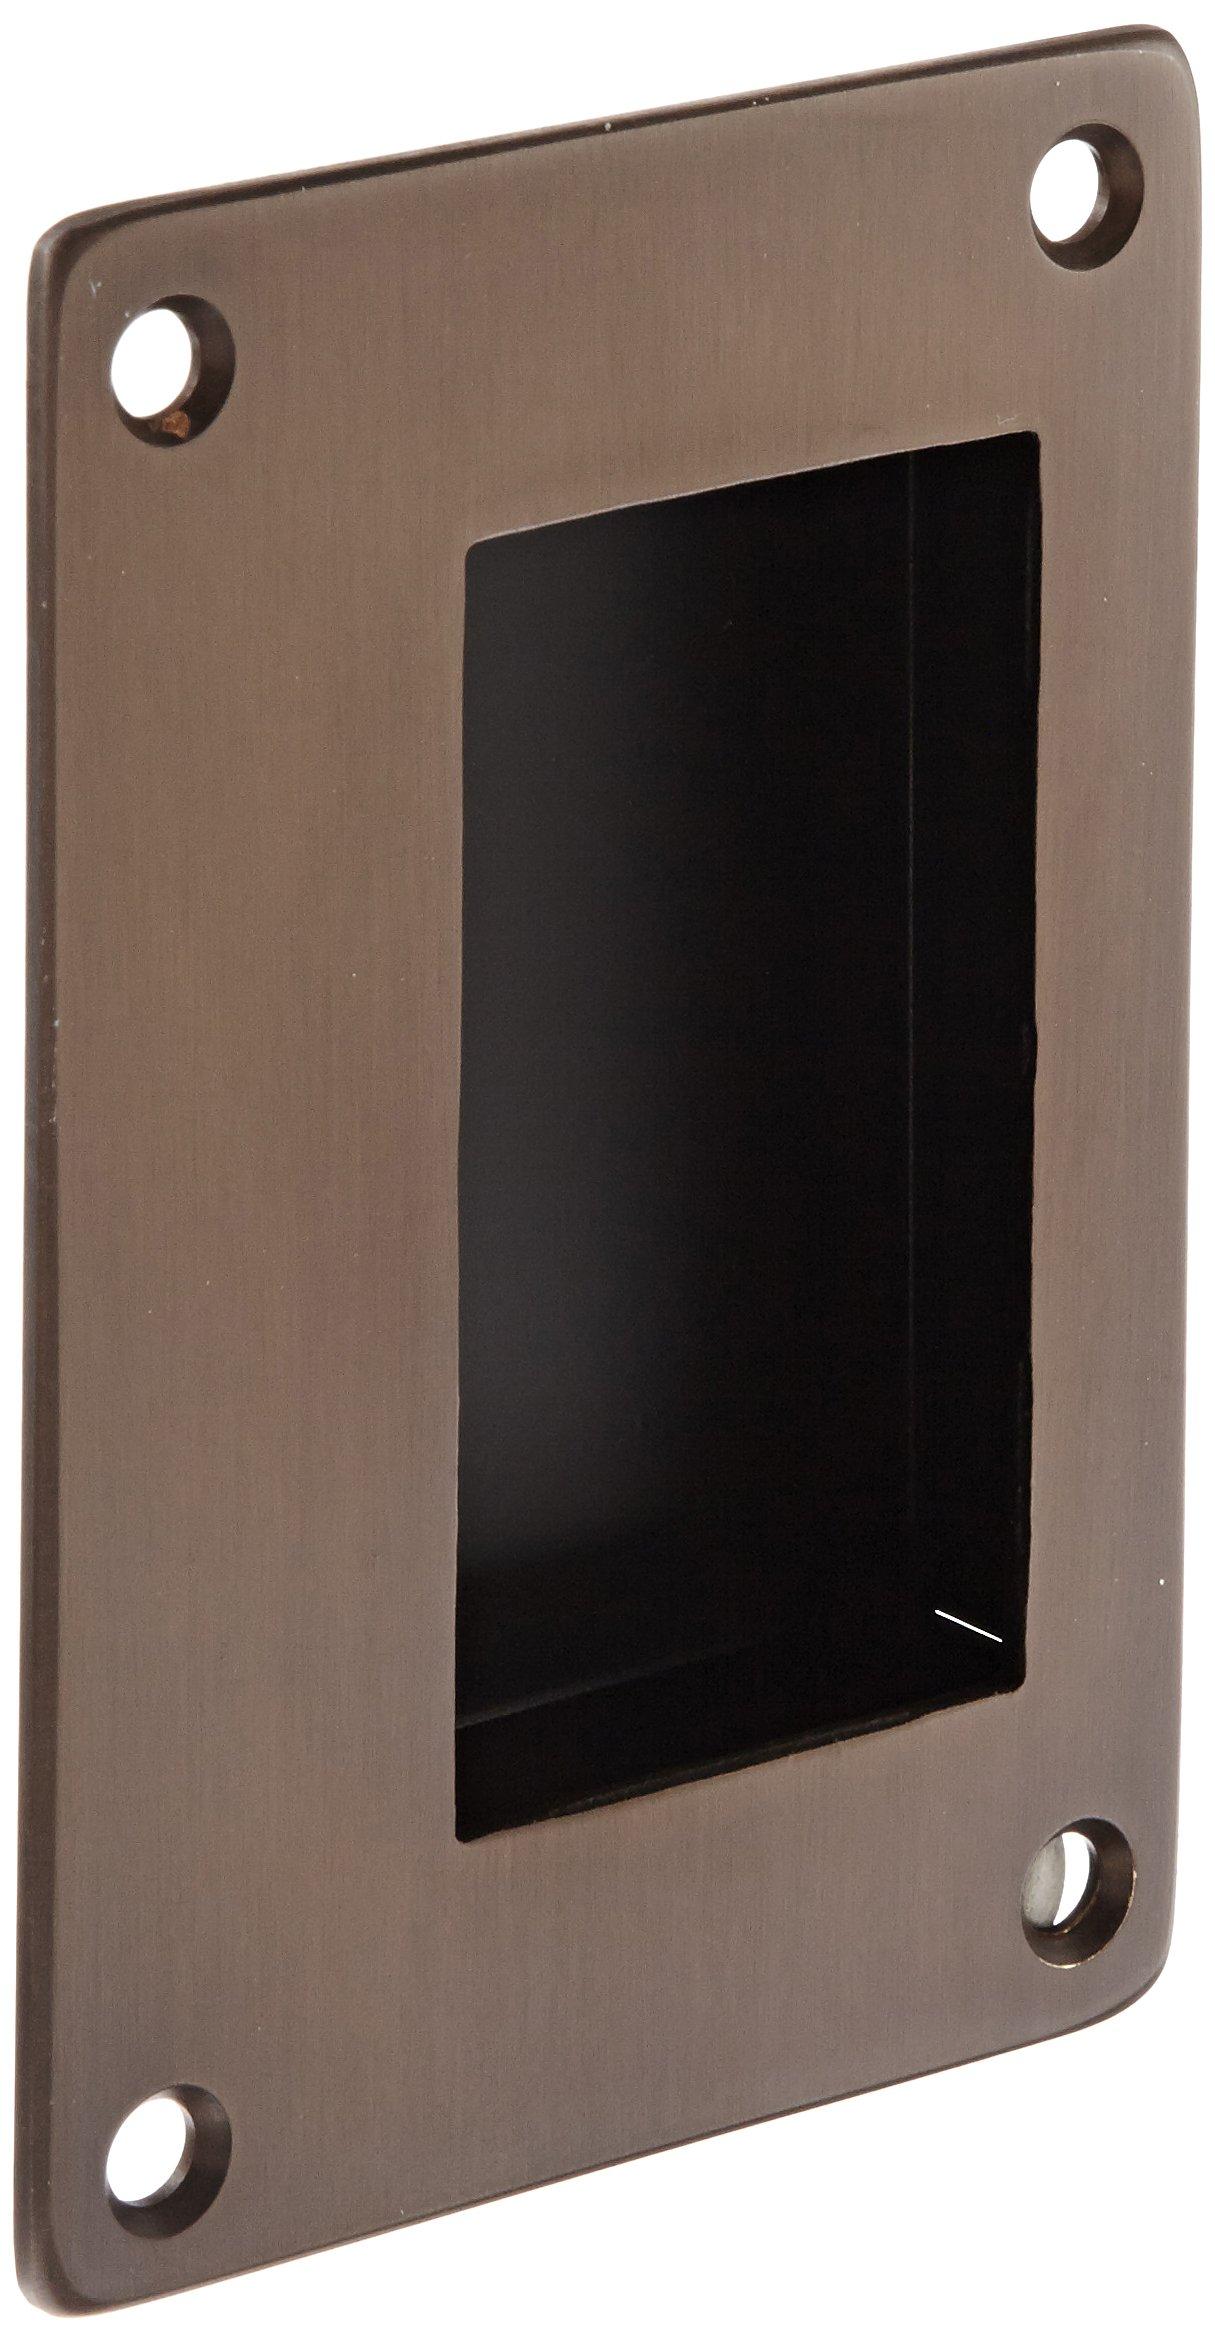 Rockwood 94BTB.10B Bronze Flush Pull Set, 3-1/2'' Width x 5'' Height x 1-3/4'' Depth, Satin Oxidized Oil Rubbed Finish